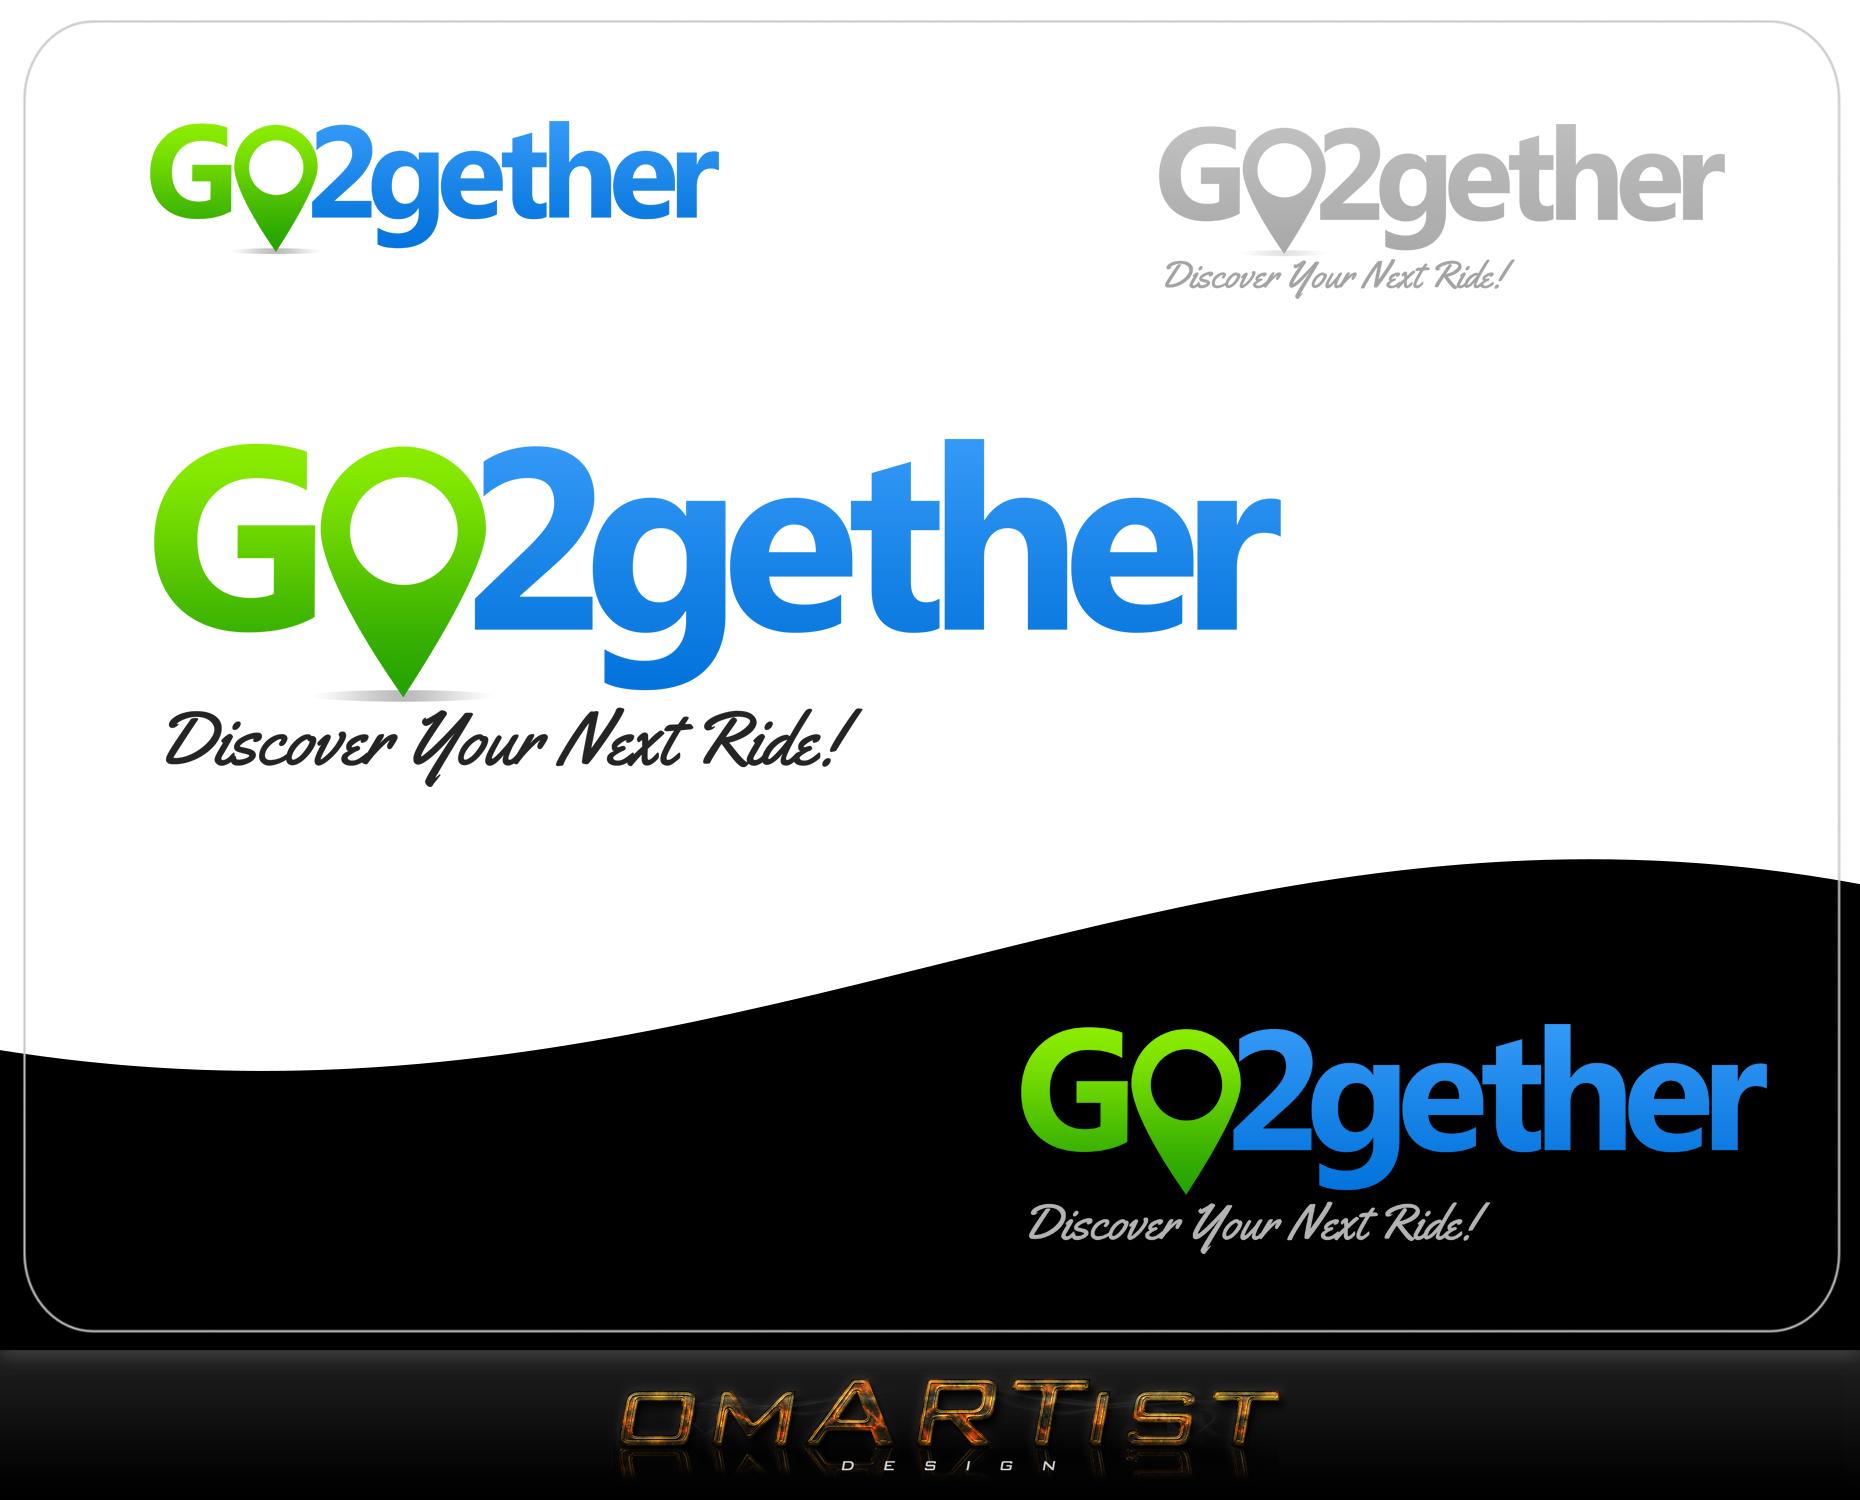 Logo Design by omARTist - Entry No. 142 in the Logo Design Contest Captivating Logo Design for GO2GETHER.